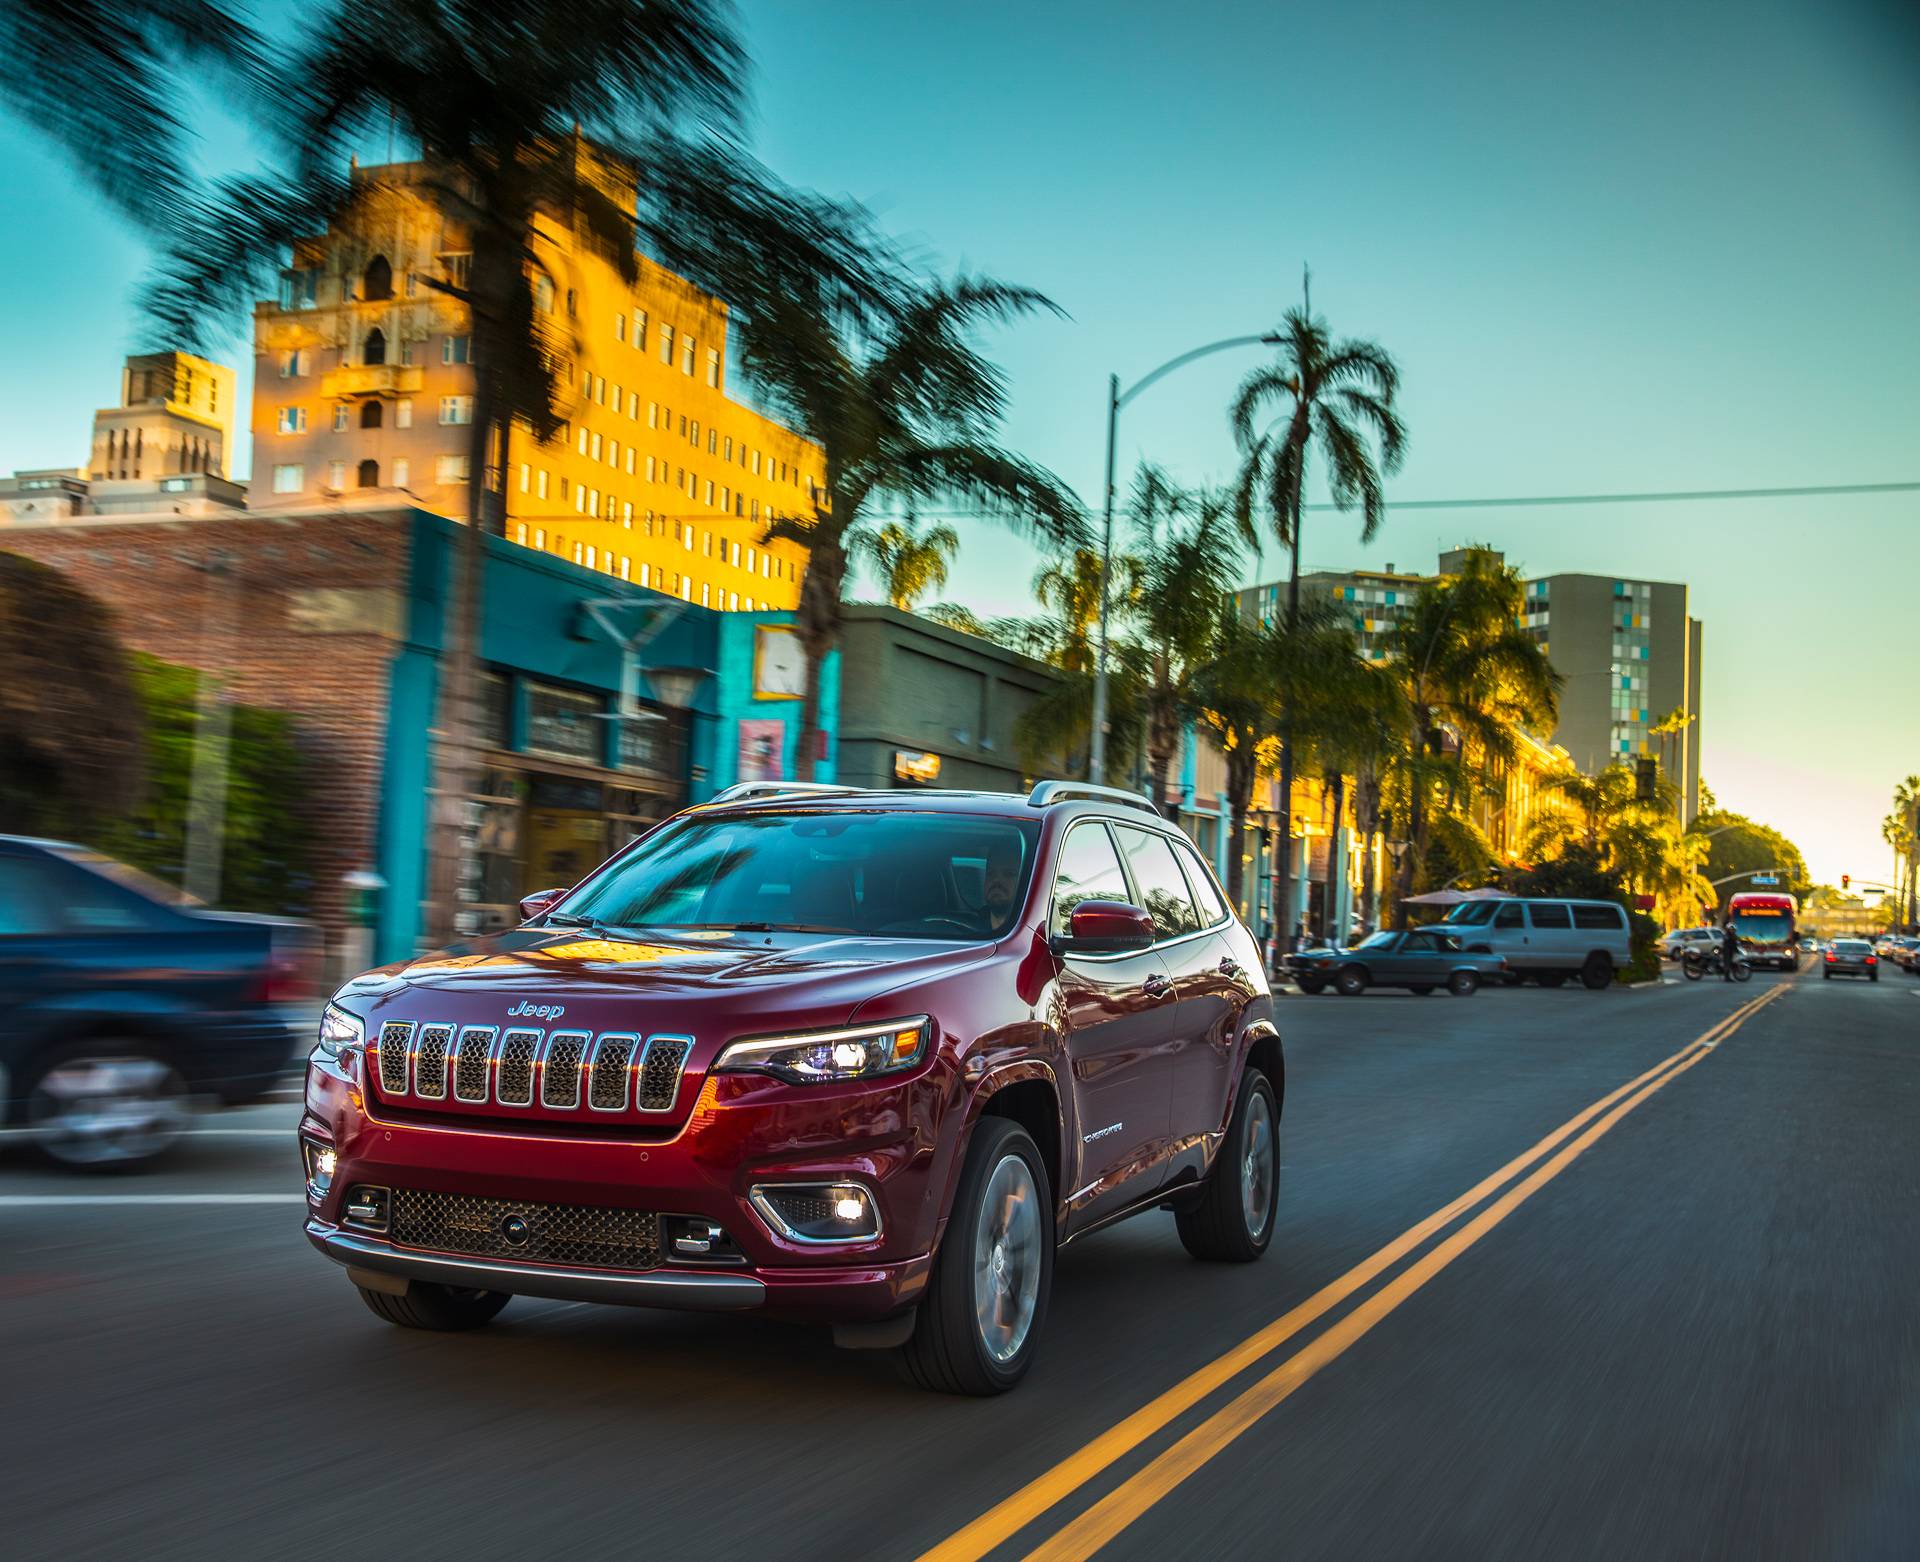 2019 Jeep Cherokee Rv Lifestyle Magazine